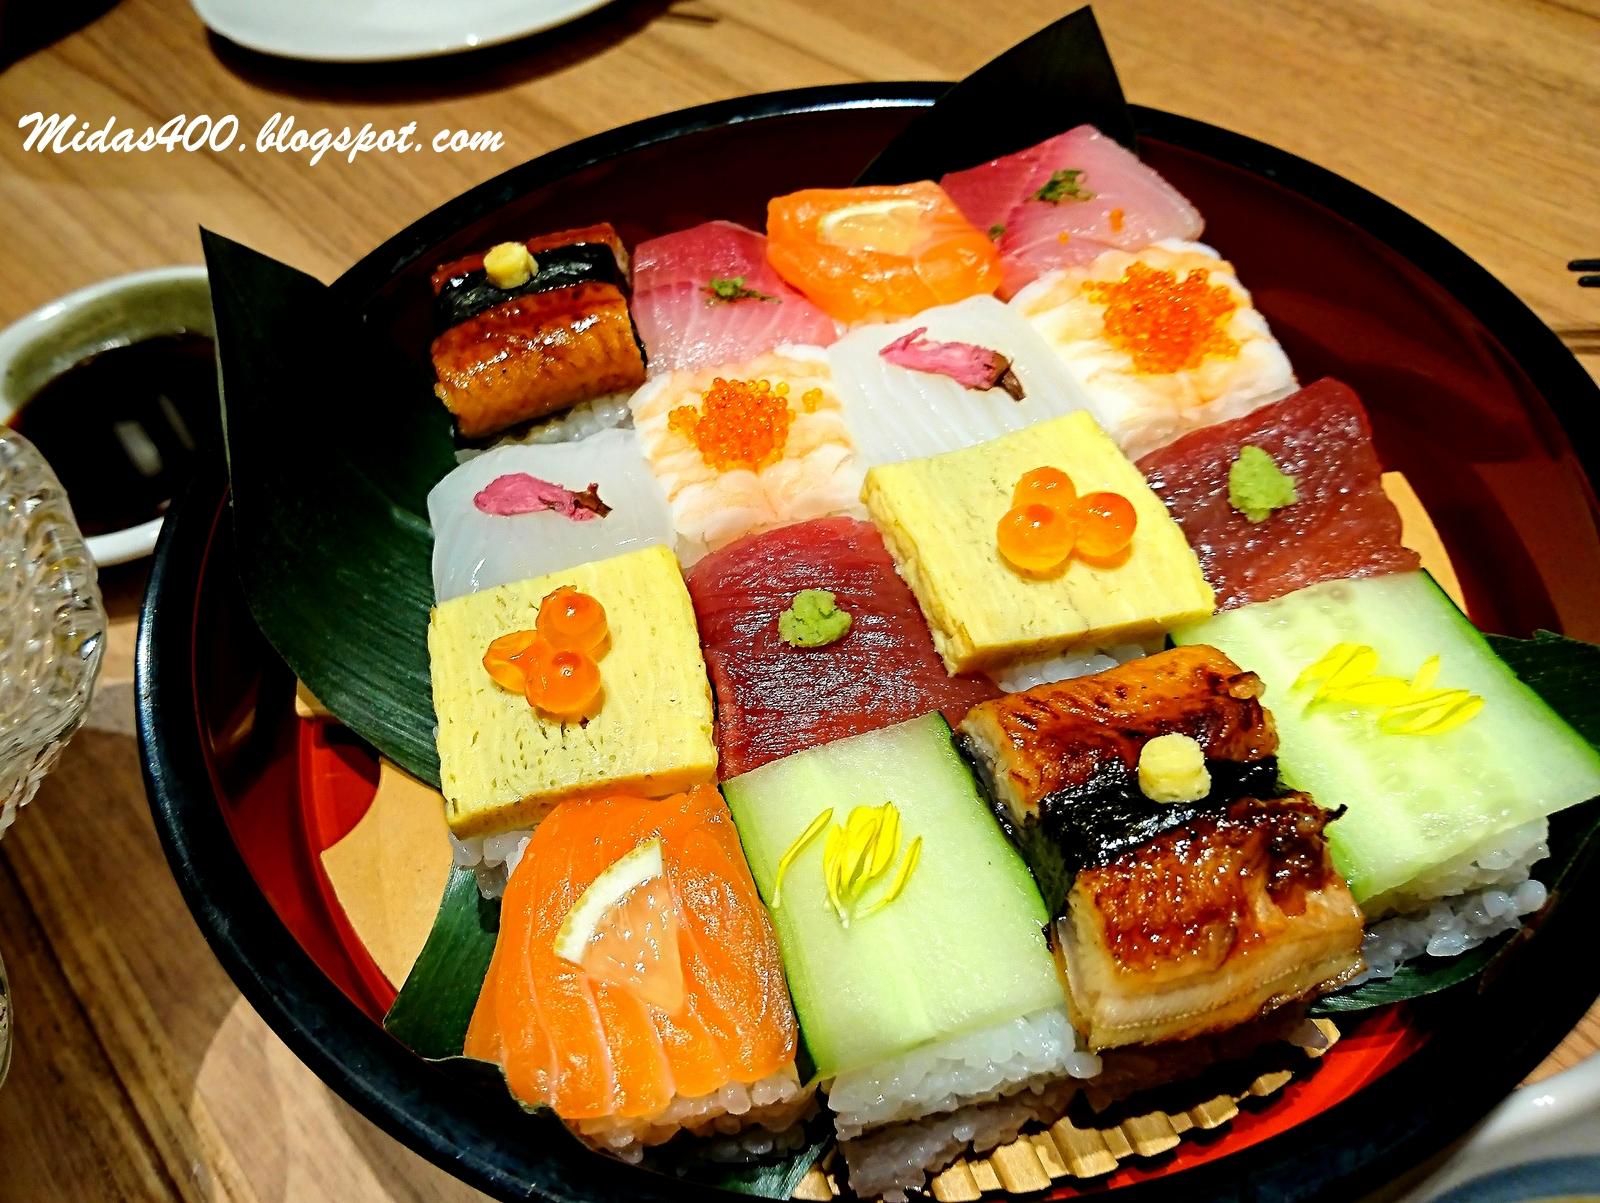 Midas Food n Travel Blog Xmas Festive Dinner at Kotobuki Wisma